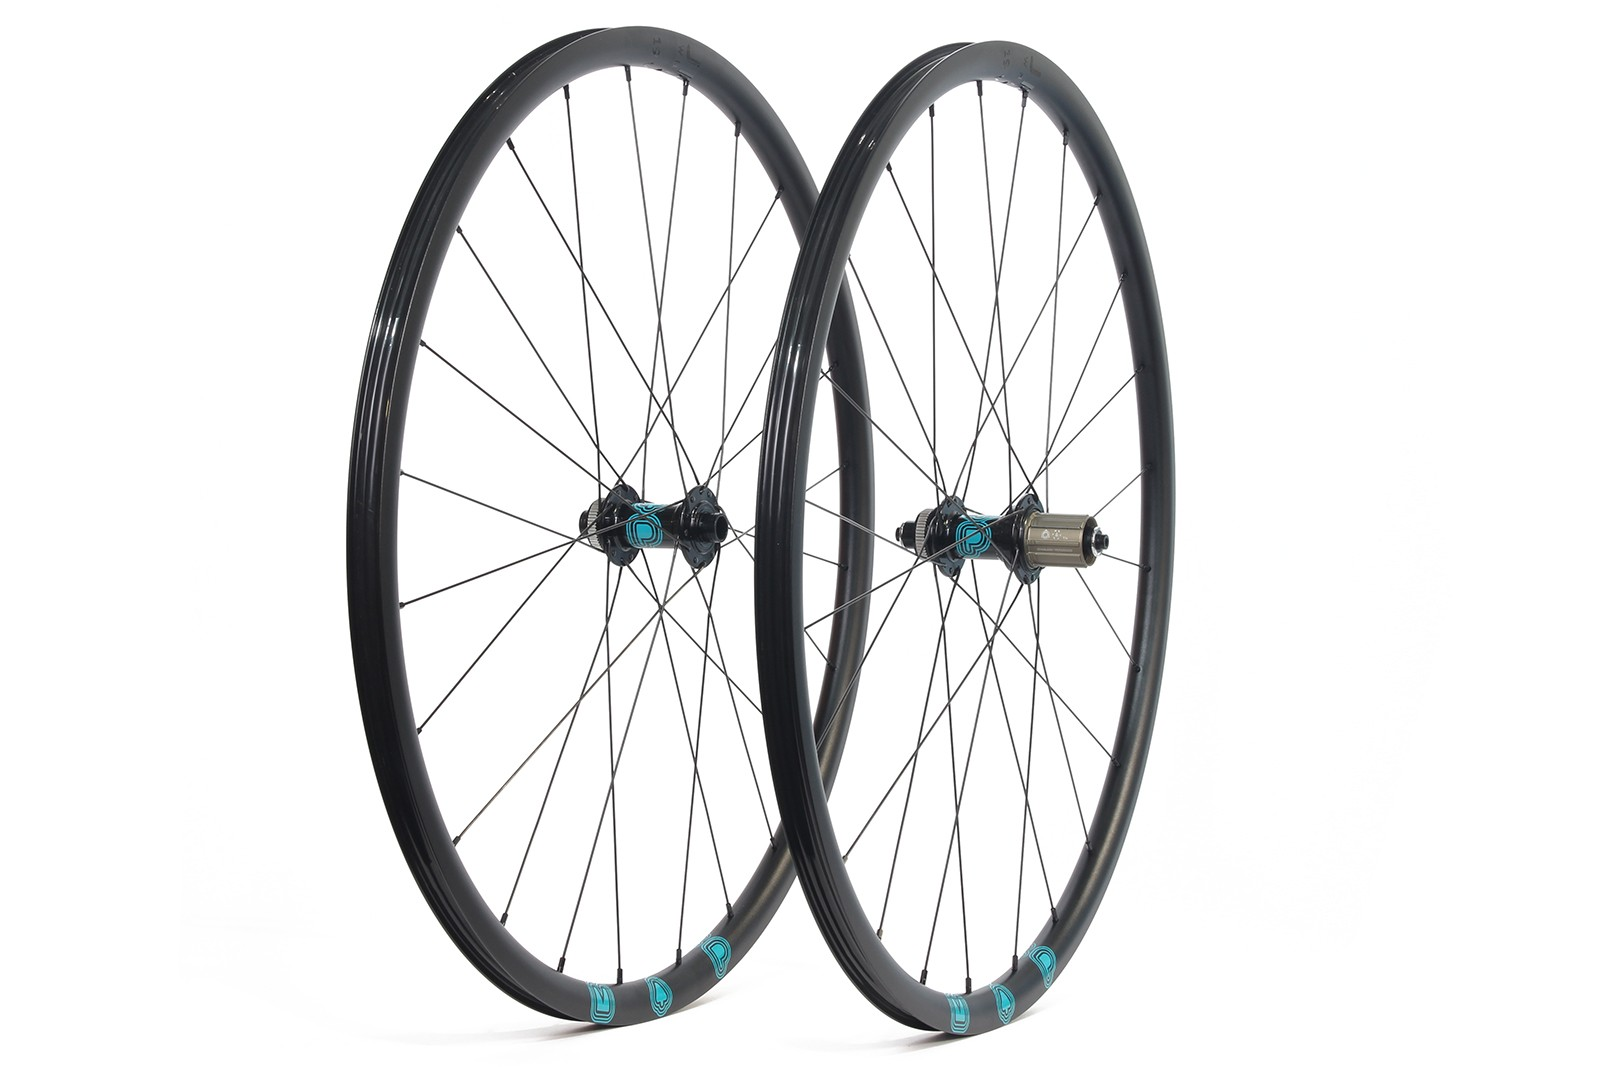 7c3f1bffc95 Home / Map road-disk wheels / Map wheels